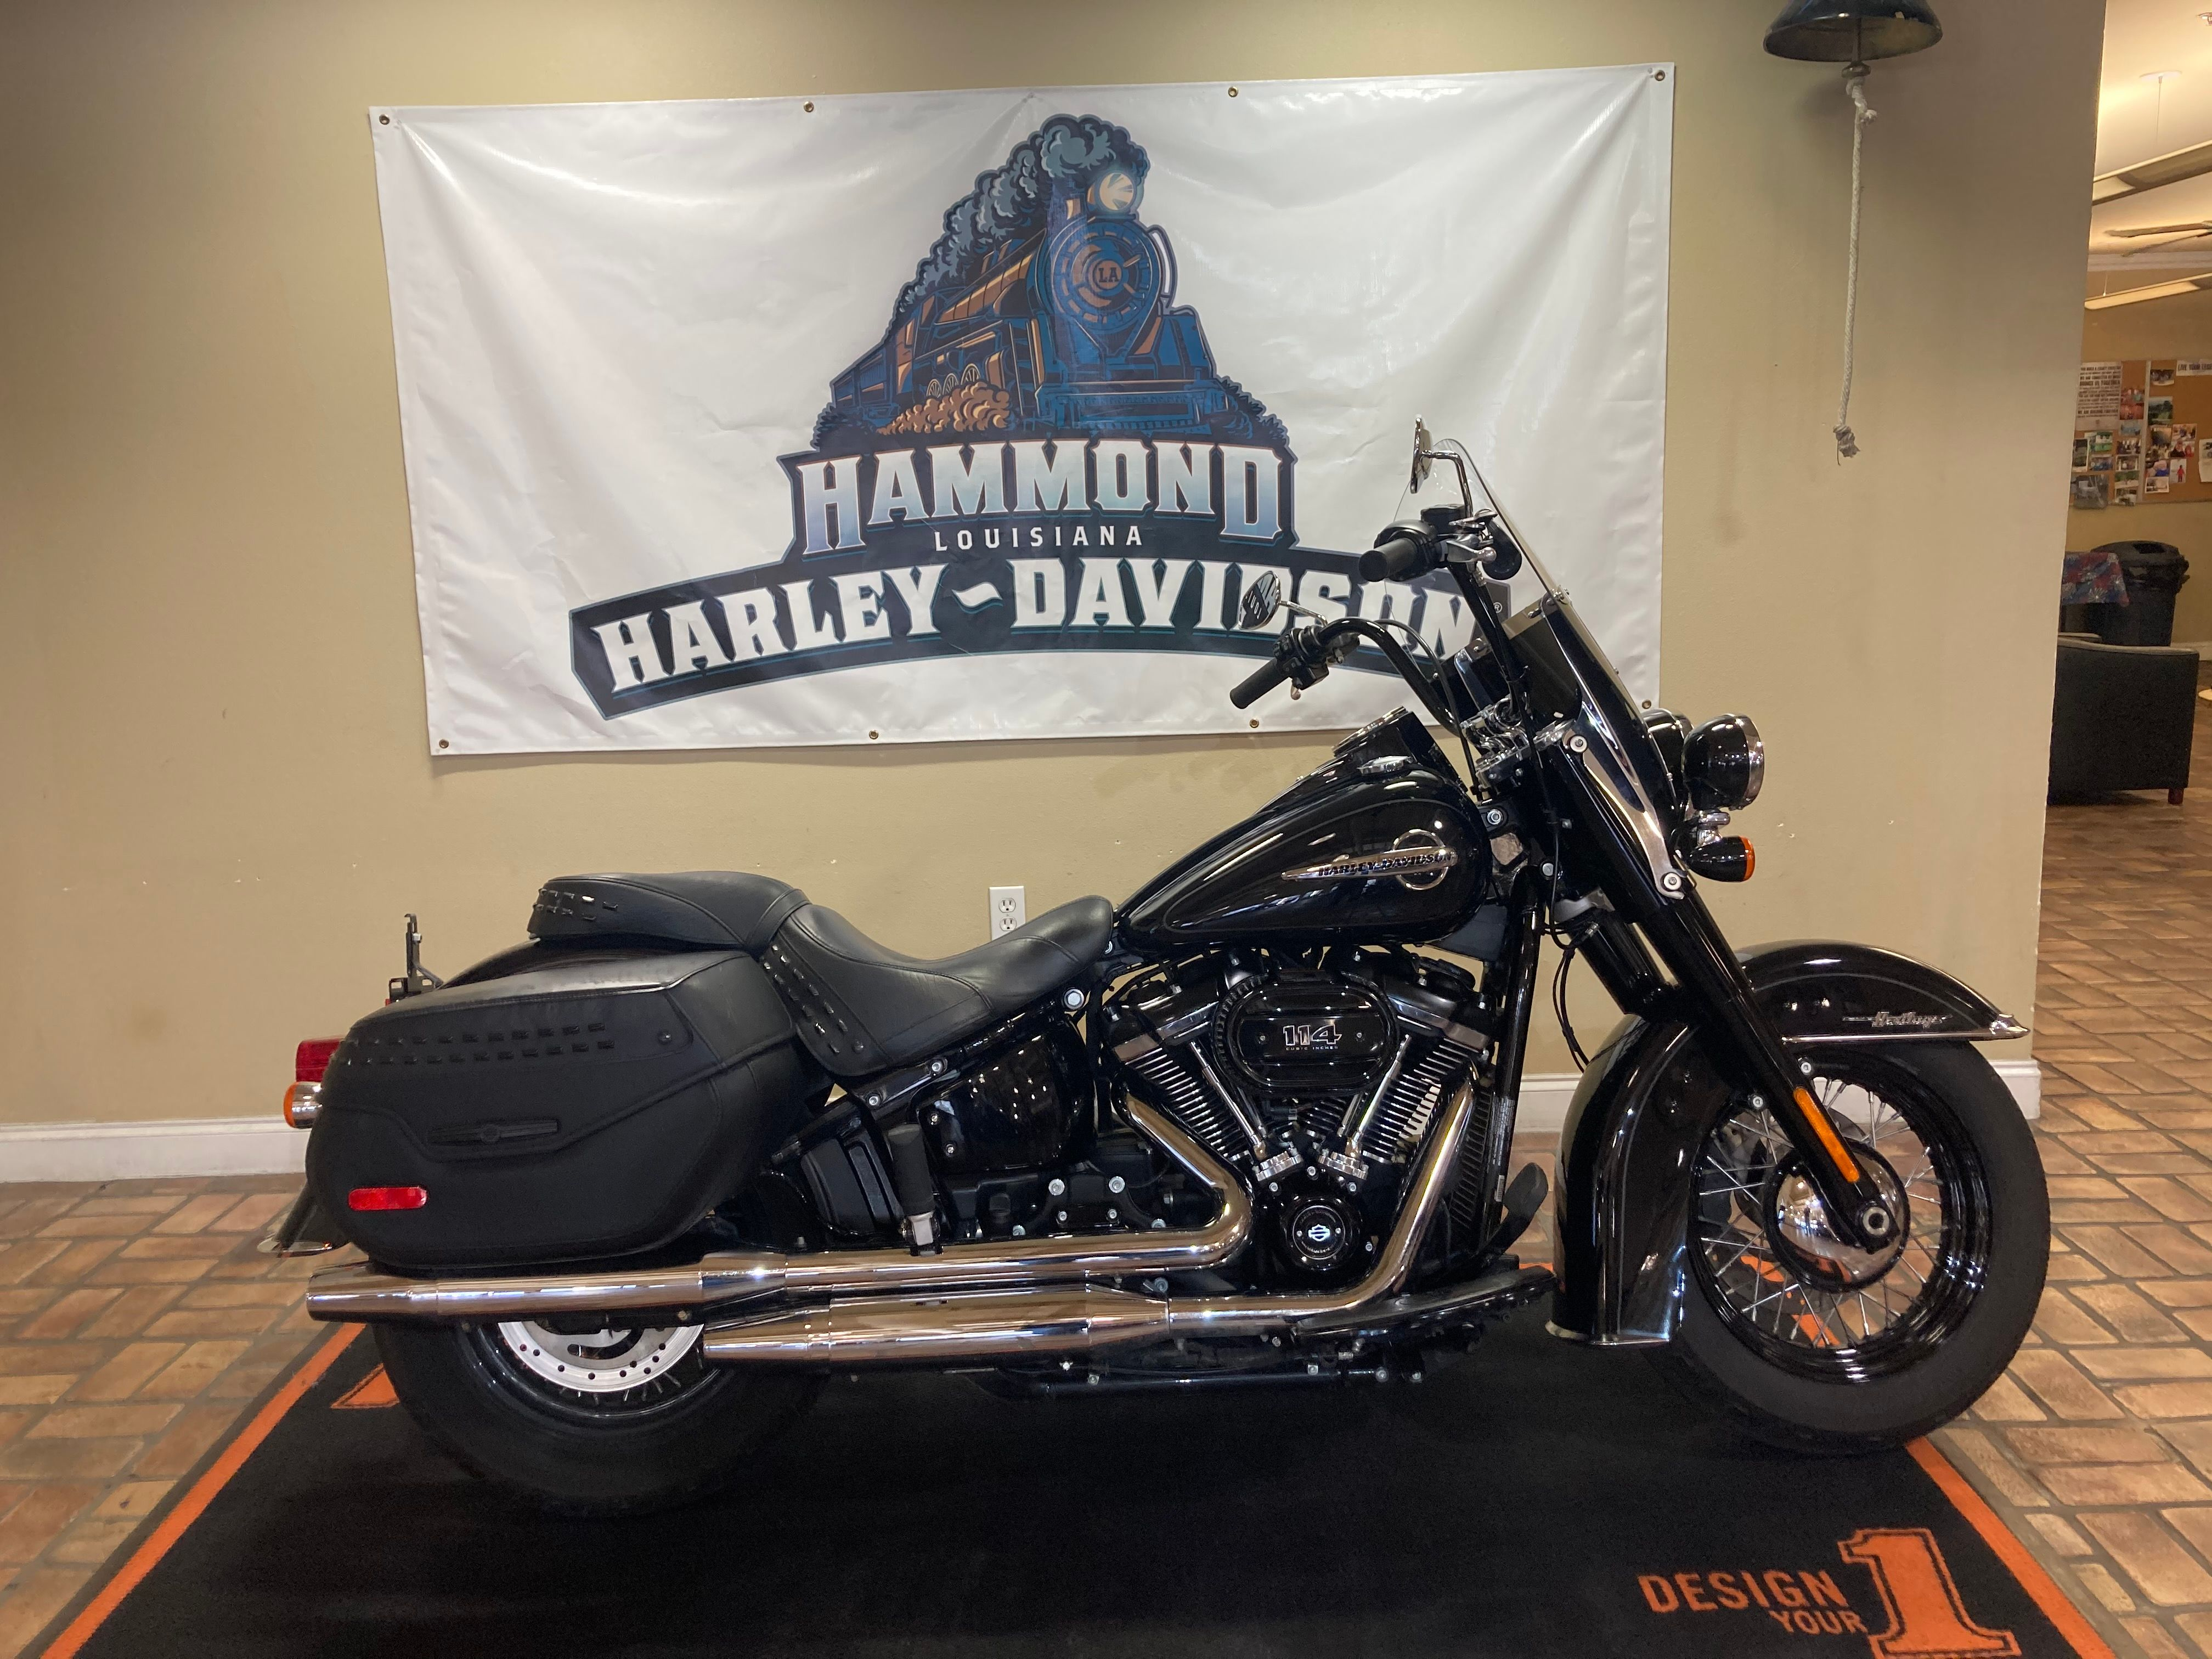 2019 Harley-Davidson Heritage Classic 114